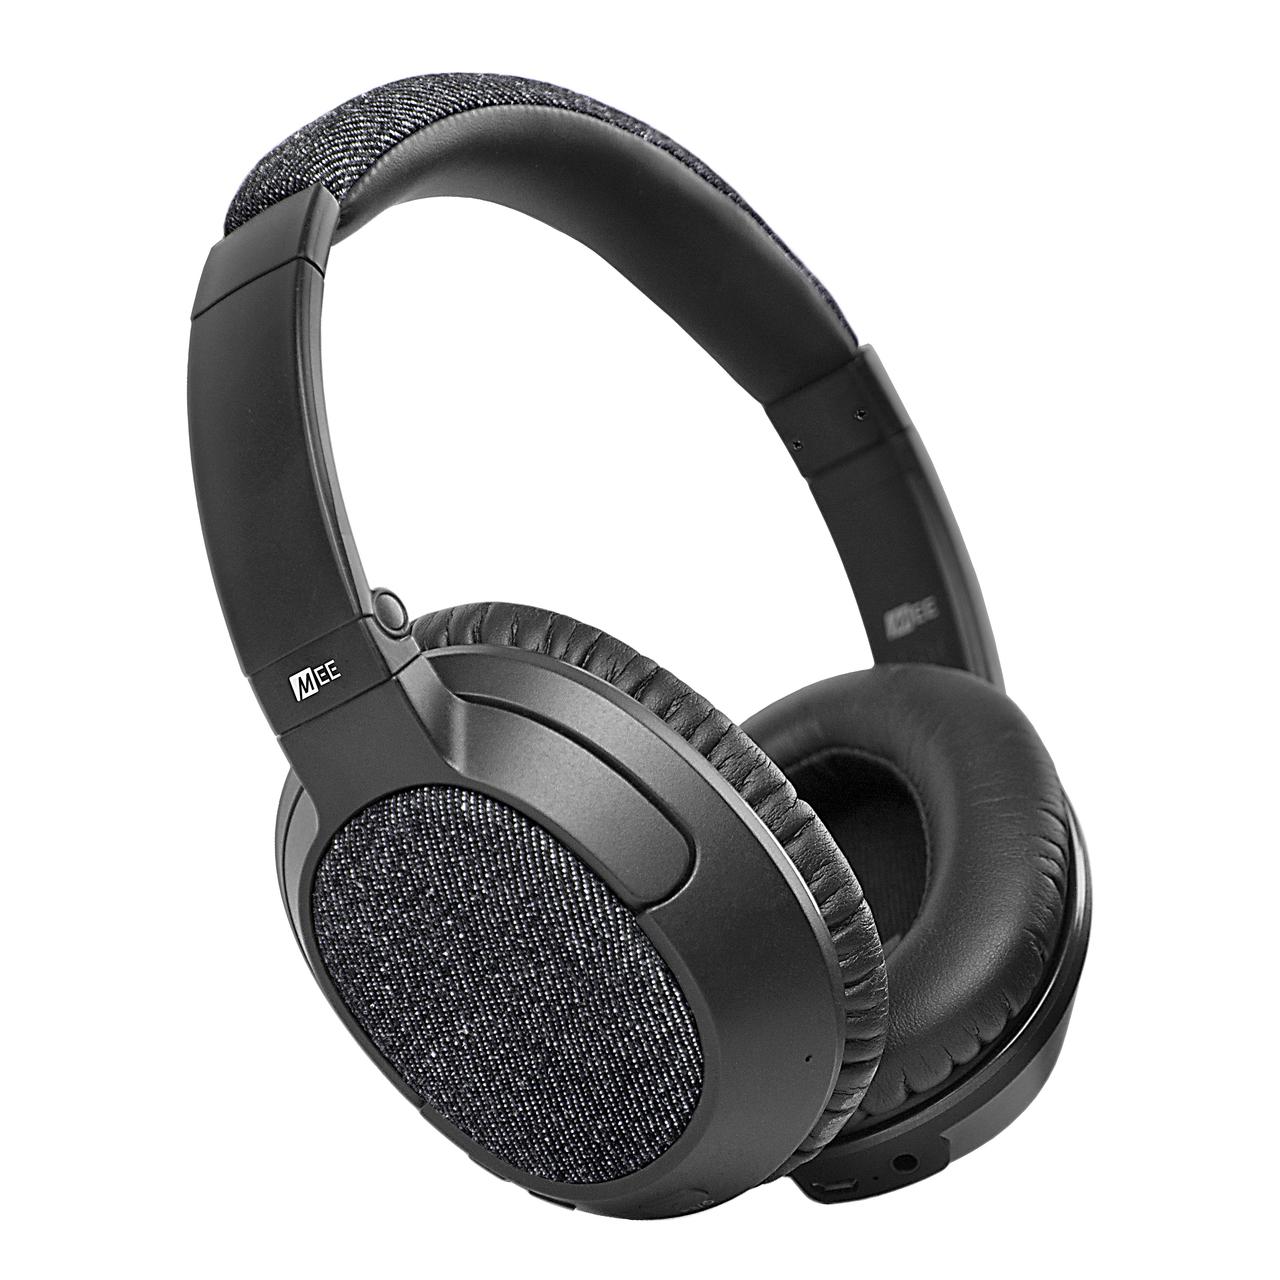 MEE Audio Matrix3 Over-the-Ear Bluetooth Wireless HD Headphone with aptX and AAC